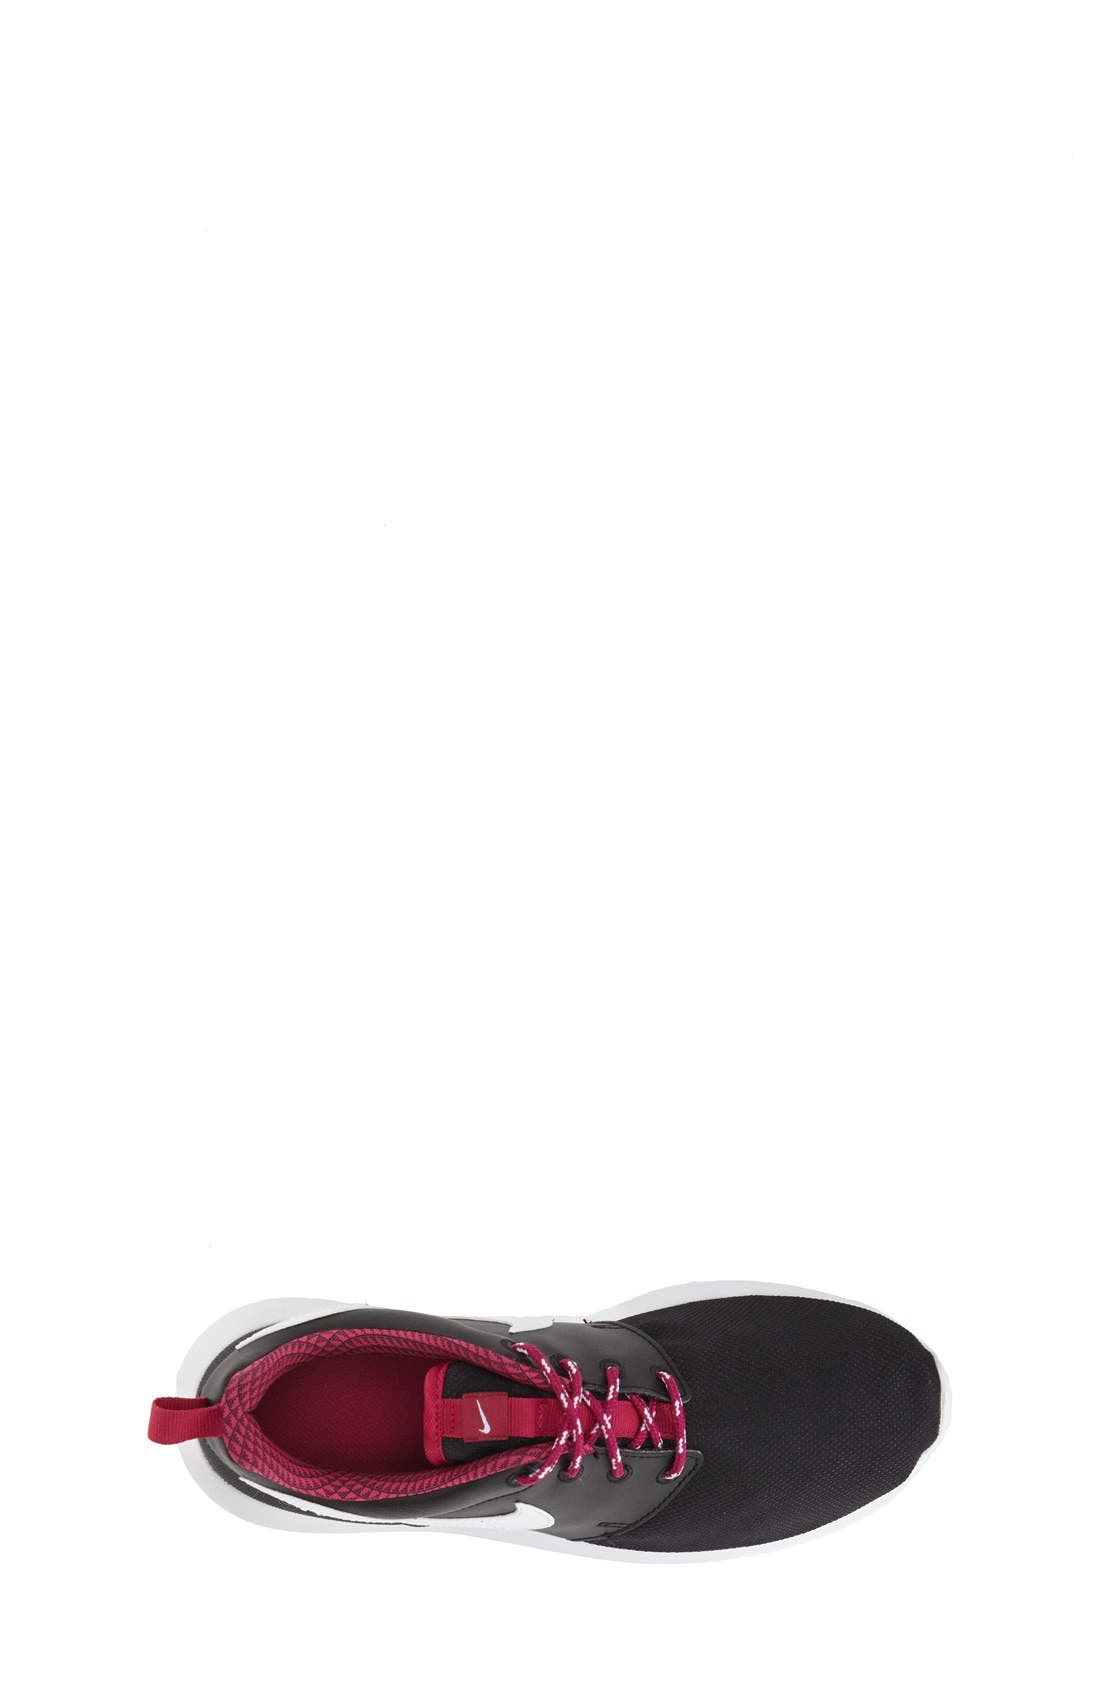 'Roshe Run' Athletic Shoe,                             Alternate thumbnail 74, color,